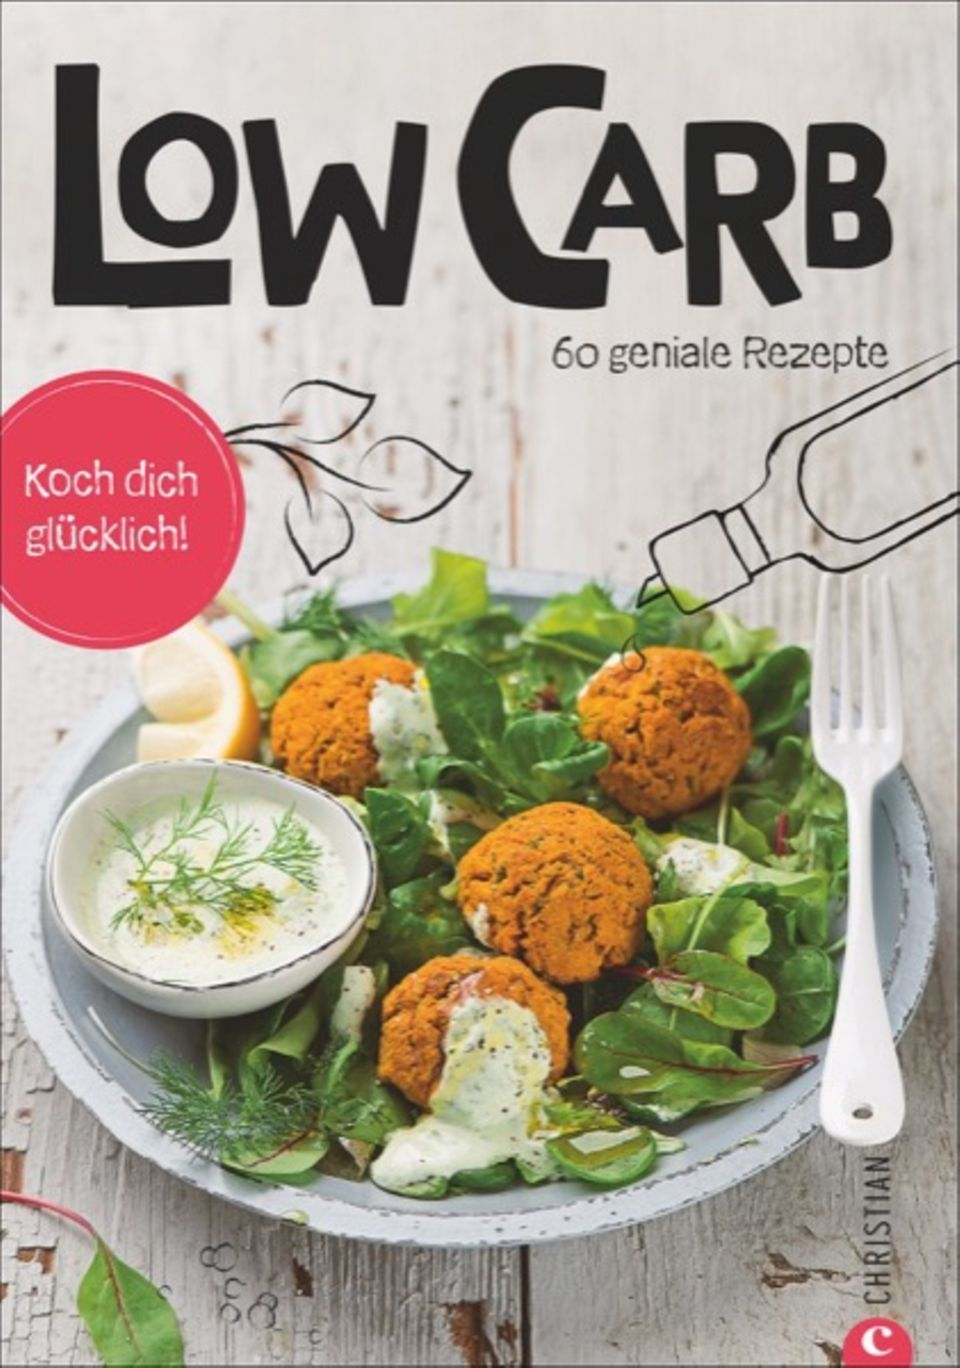 "Mehr Low Carb Rezepte in: ""Low Carb. 60 geniale Rezepte"". Christian Verlag. 112 Seiten. 10 Euro."